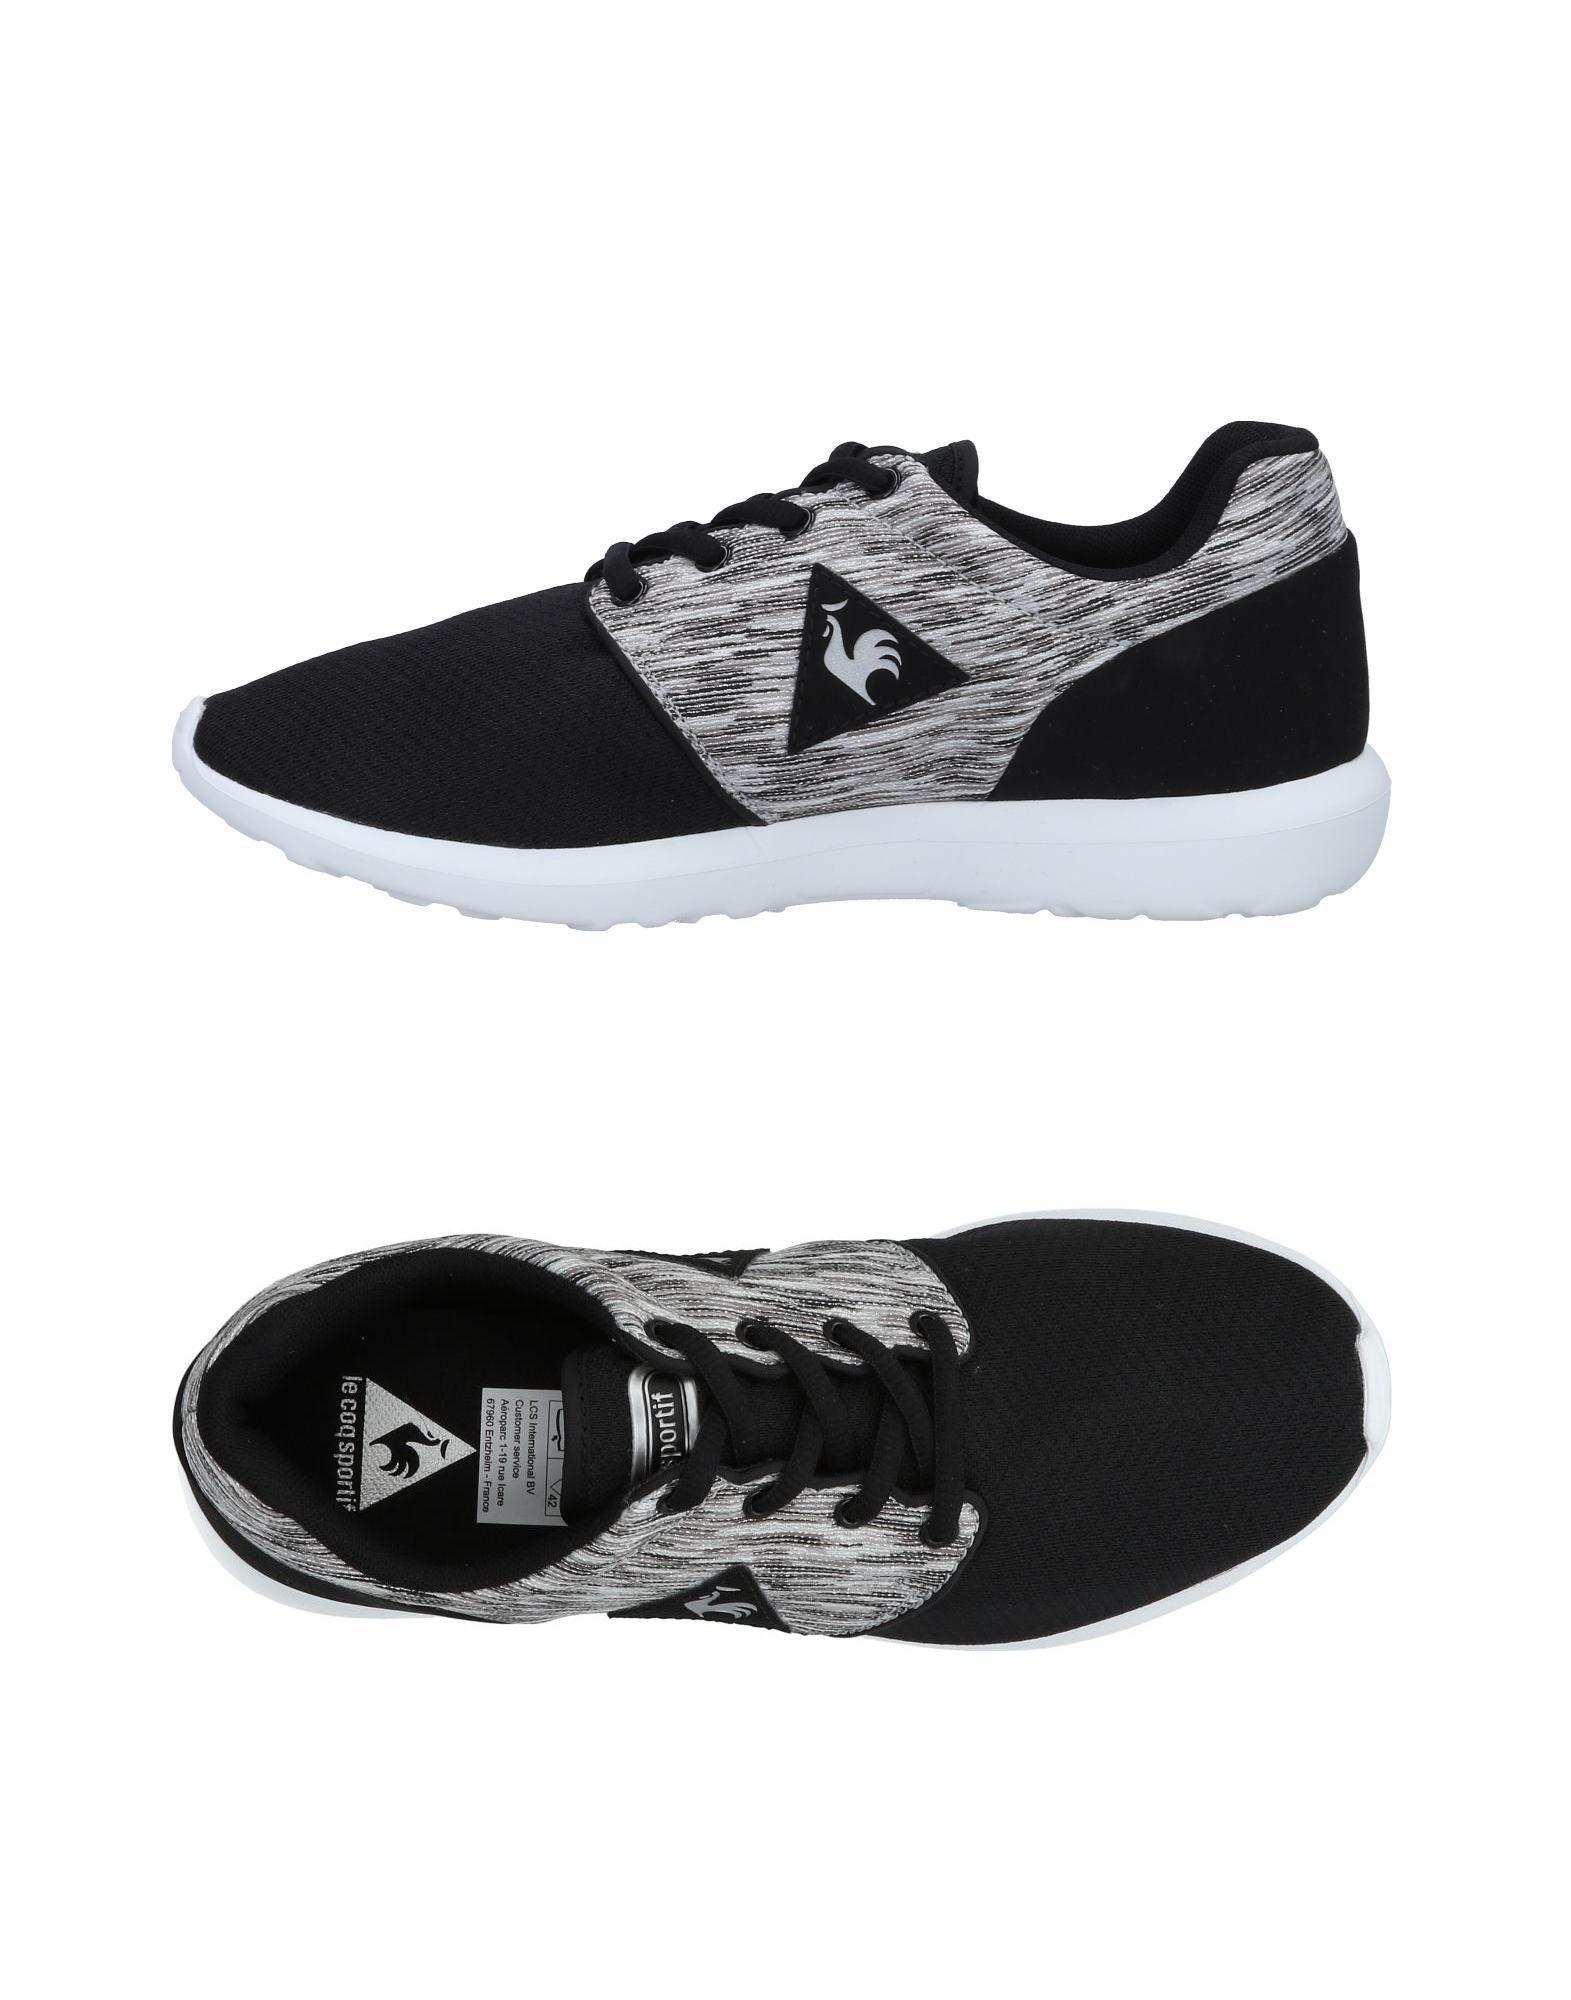 Le Coq Sportif Sneakers Damen  11497309WK Gute Qualität beliebte Schuhe